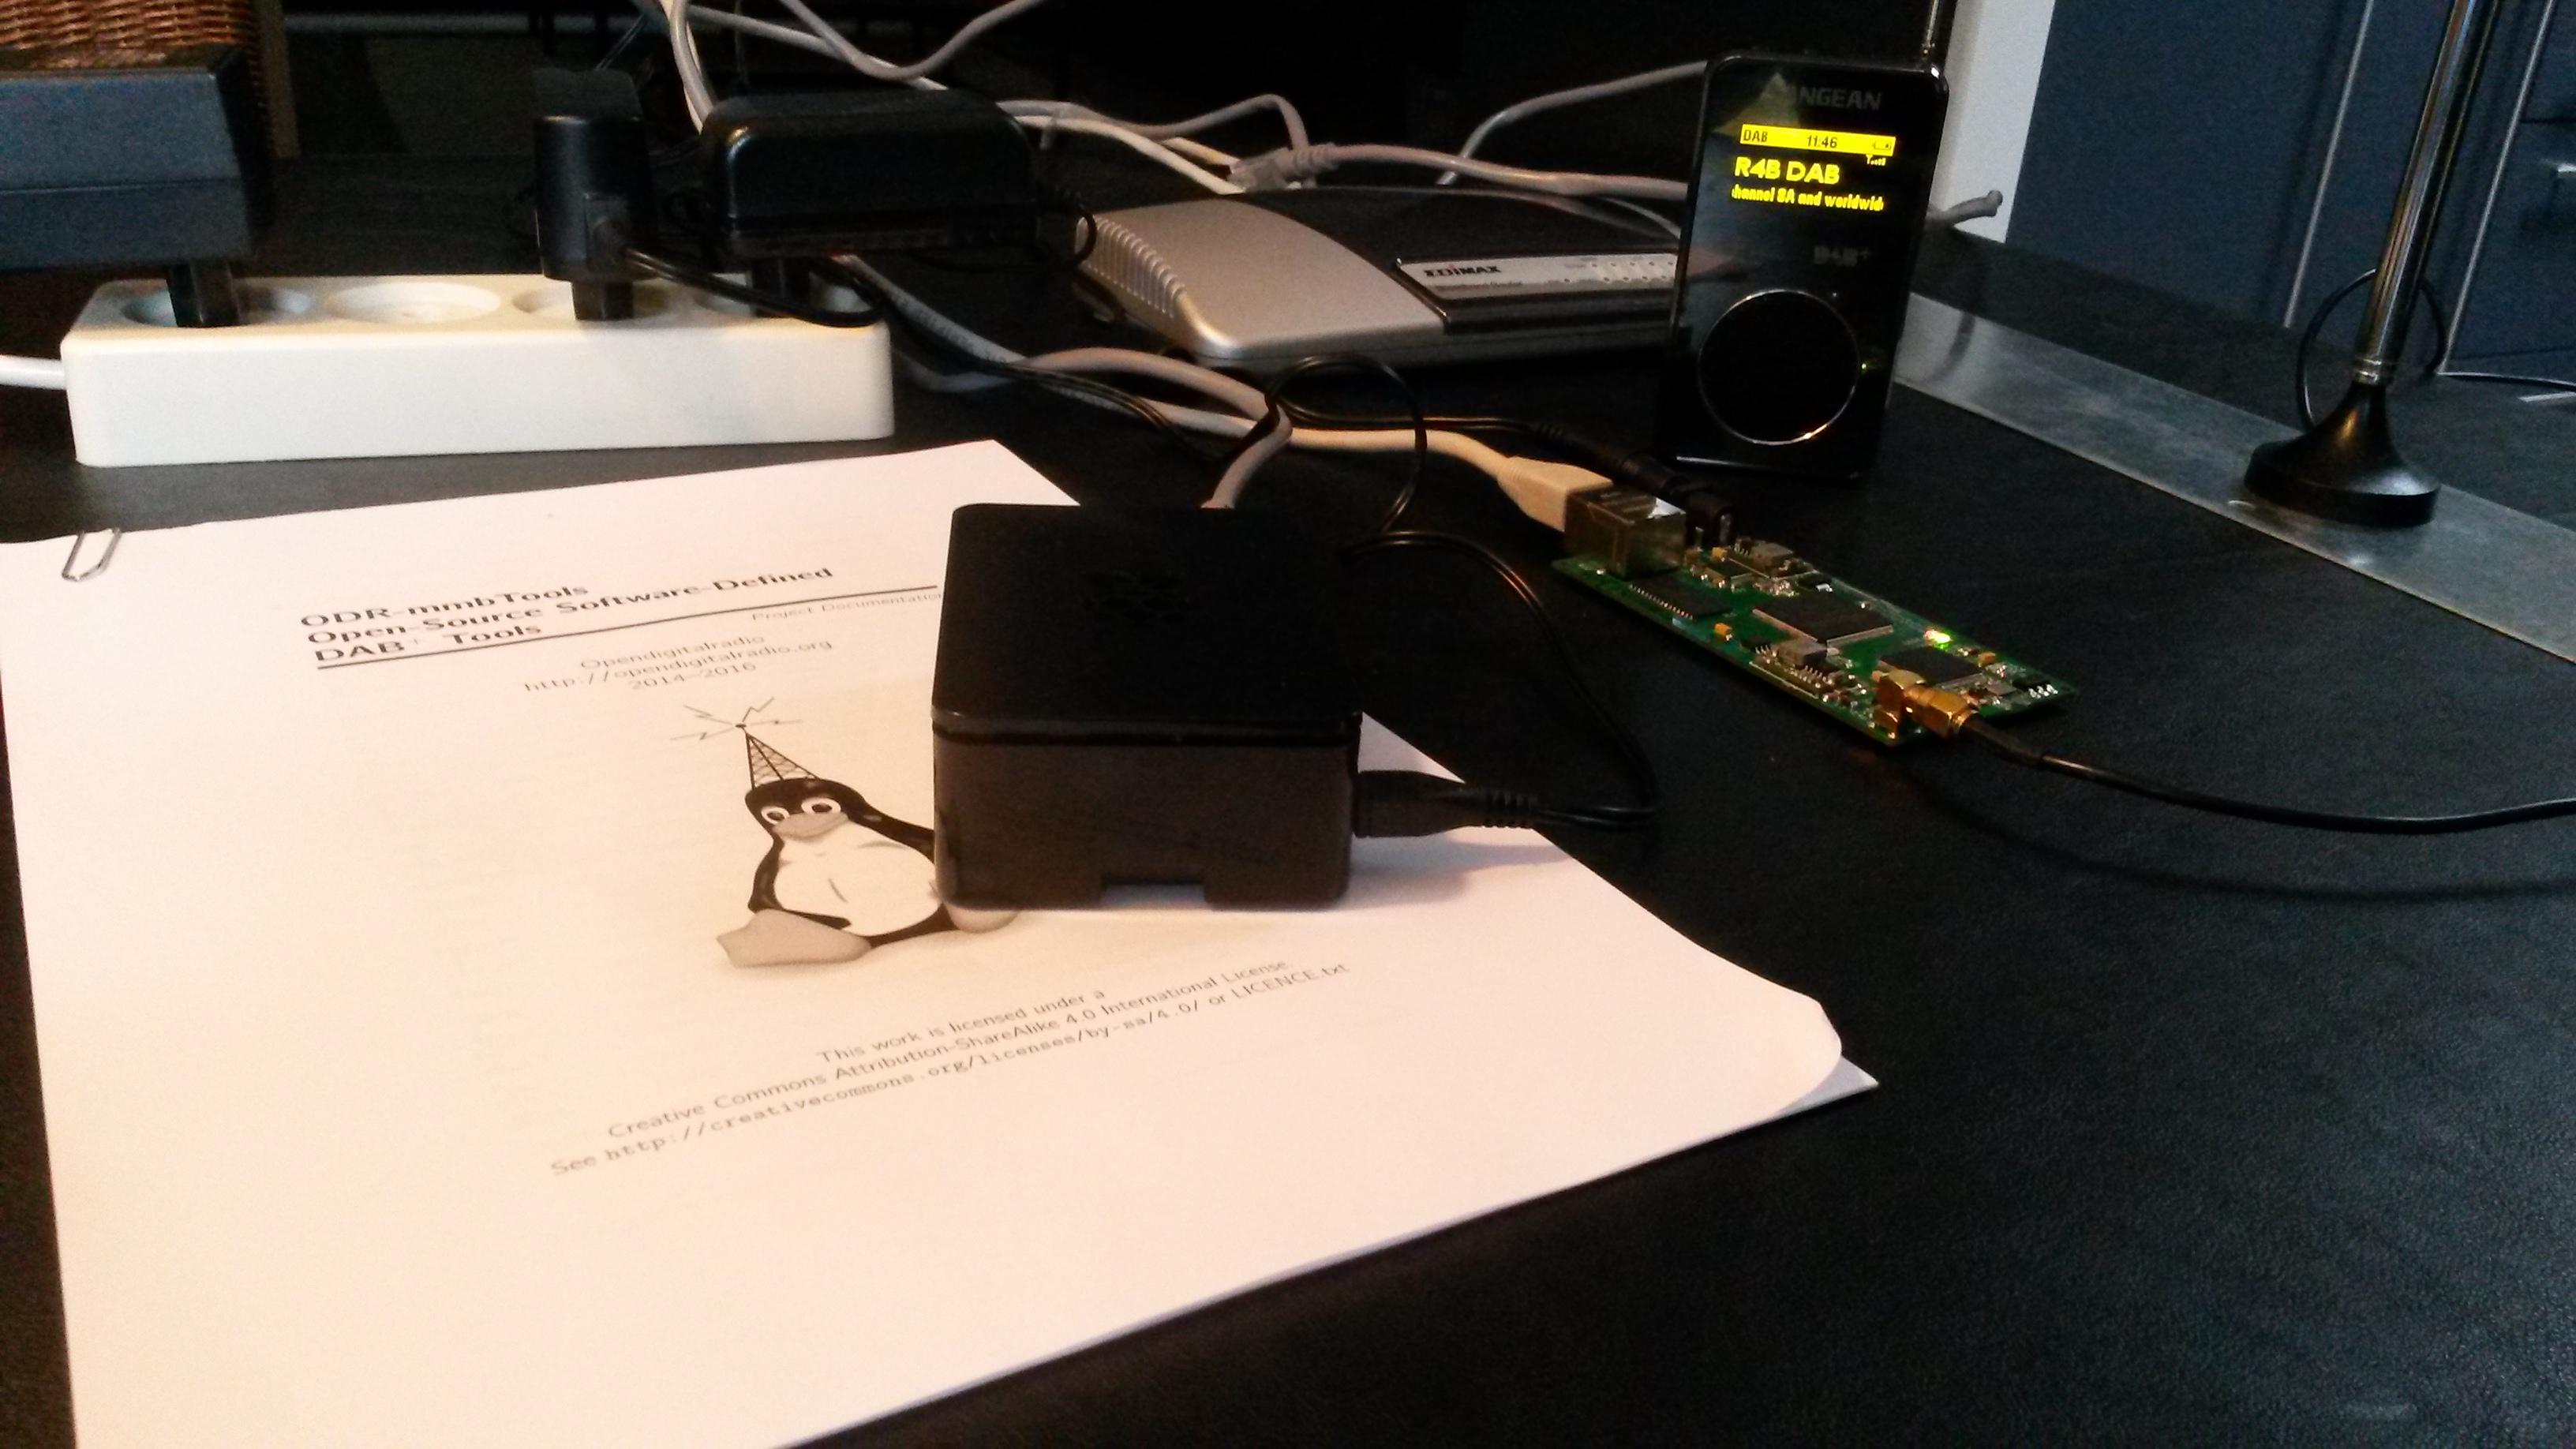 Photo of a RaspDAB setup